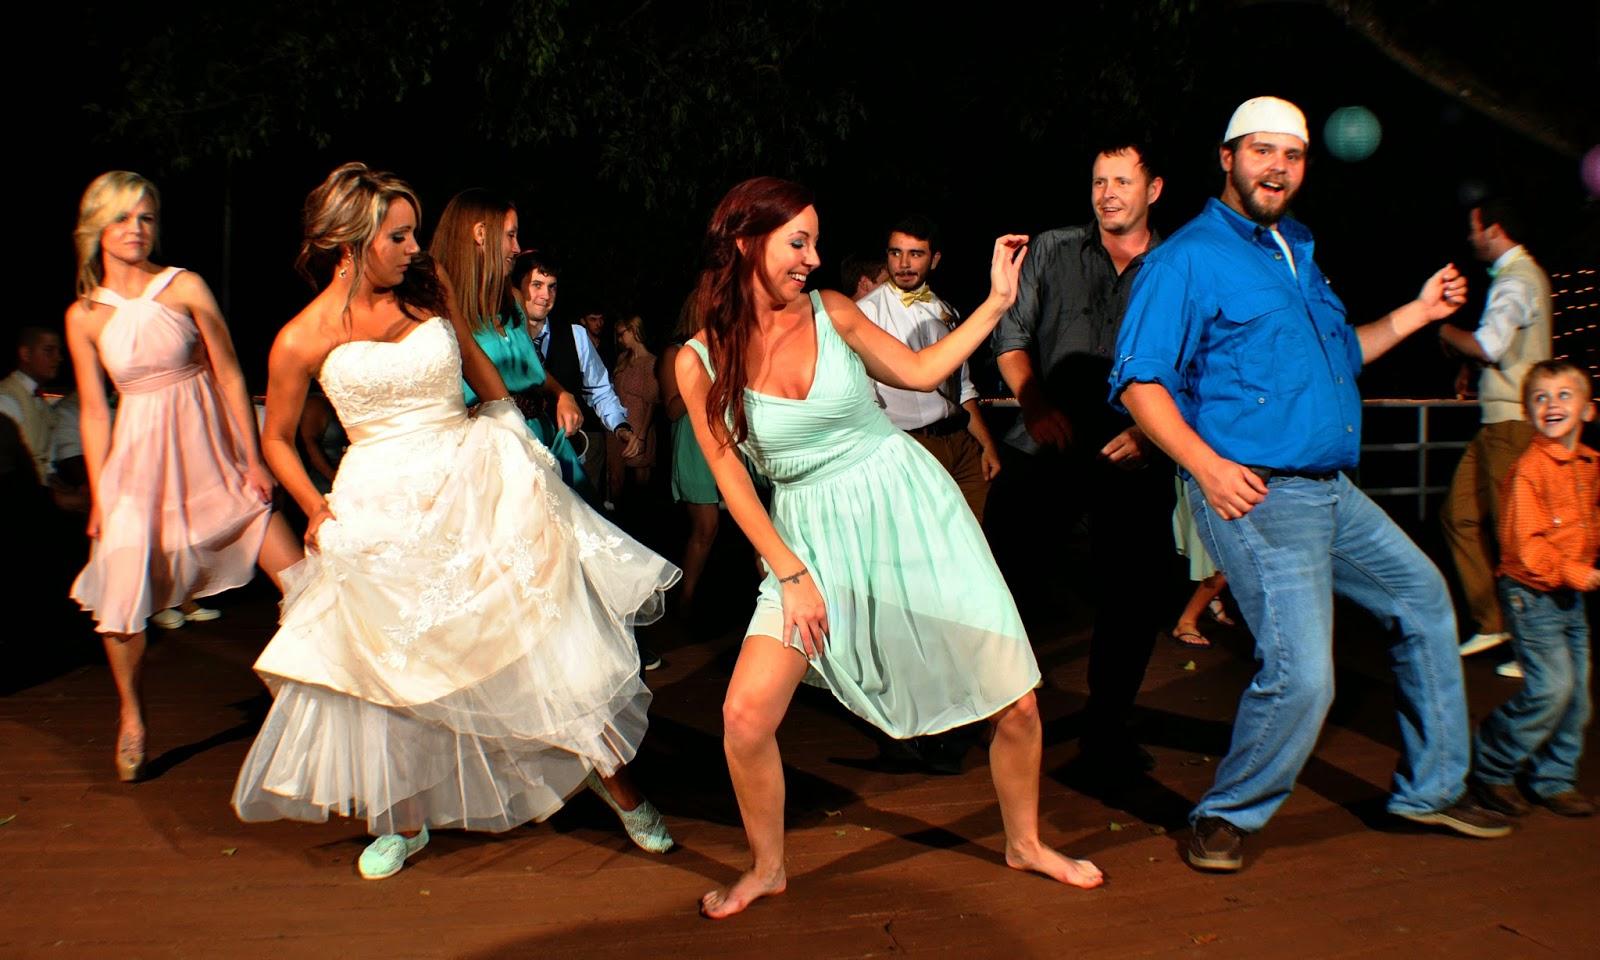 With Class LLC Wedding Coordination Party DJ - River Inn Events - Suck Creek, TN